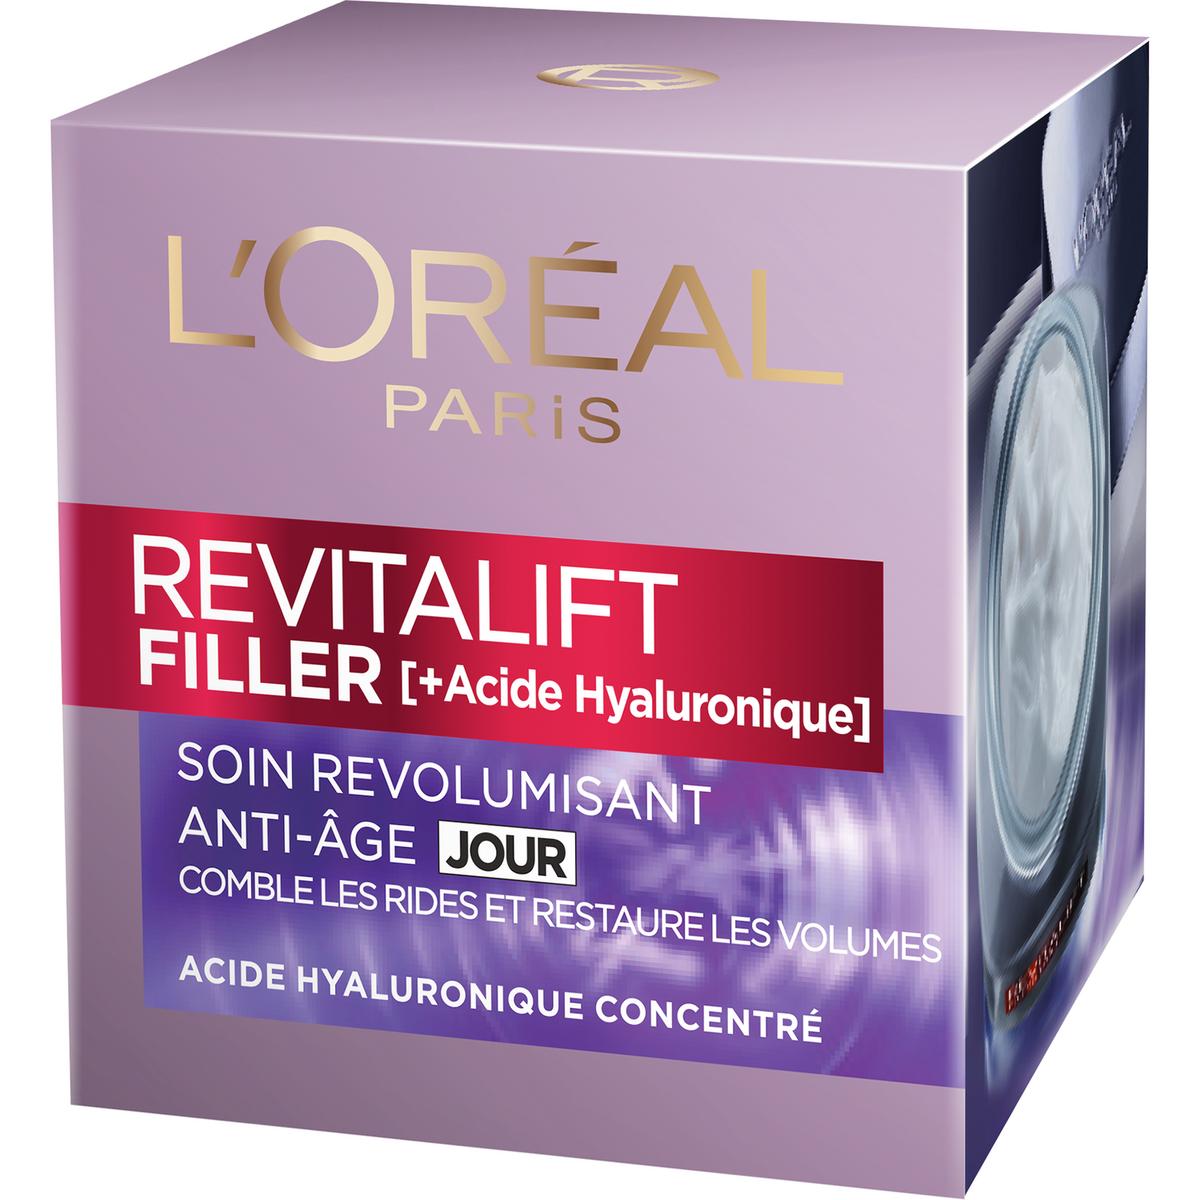 L'Oréal Revitalift soin de jour revolumisant anti-âge 50ml